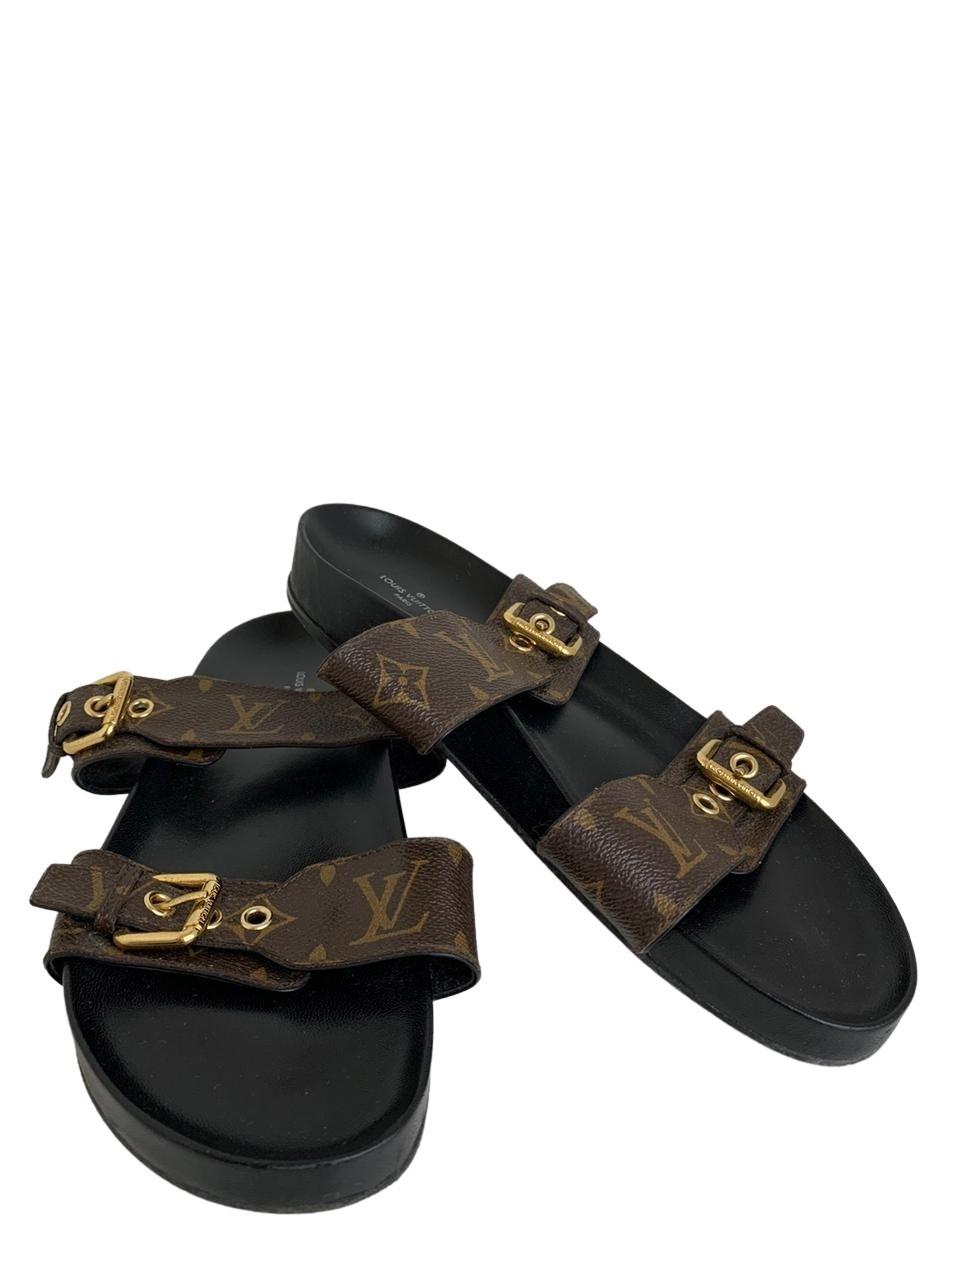 Slide Louis Vuitton